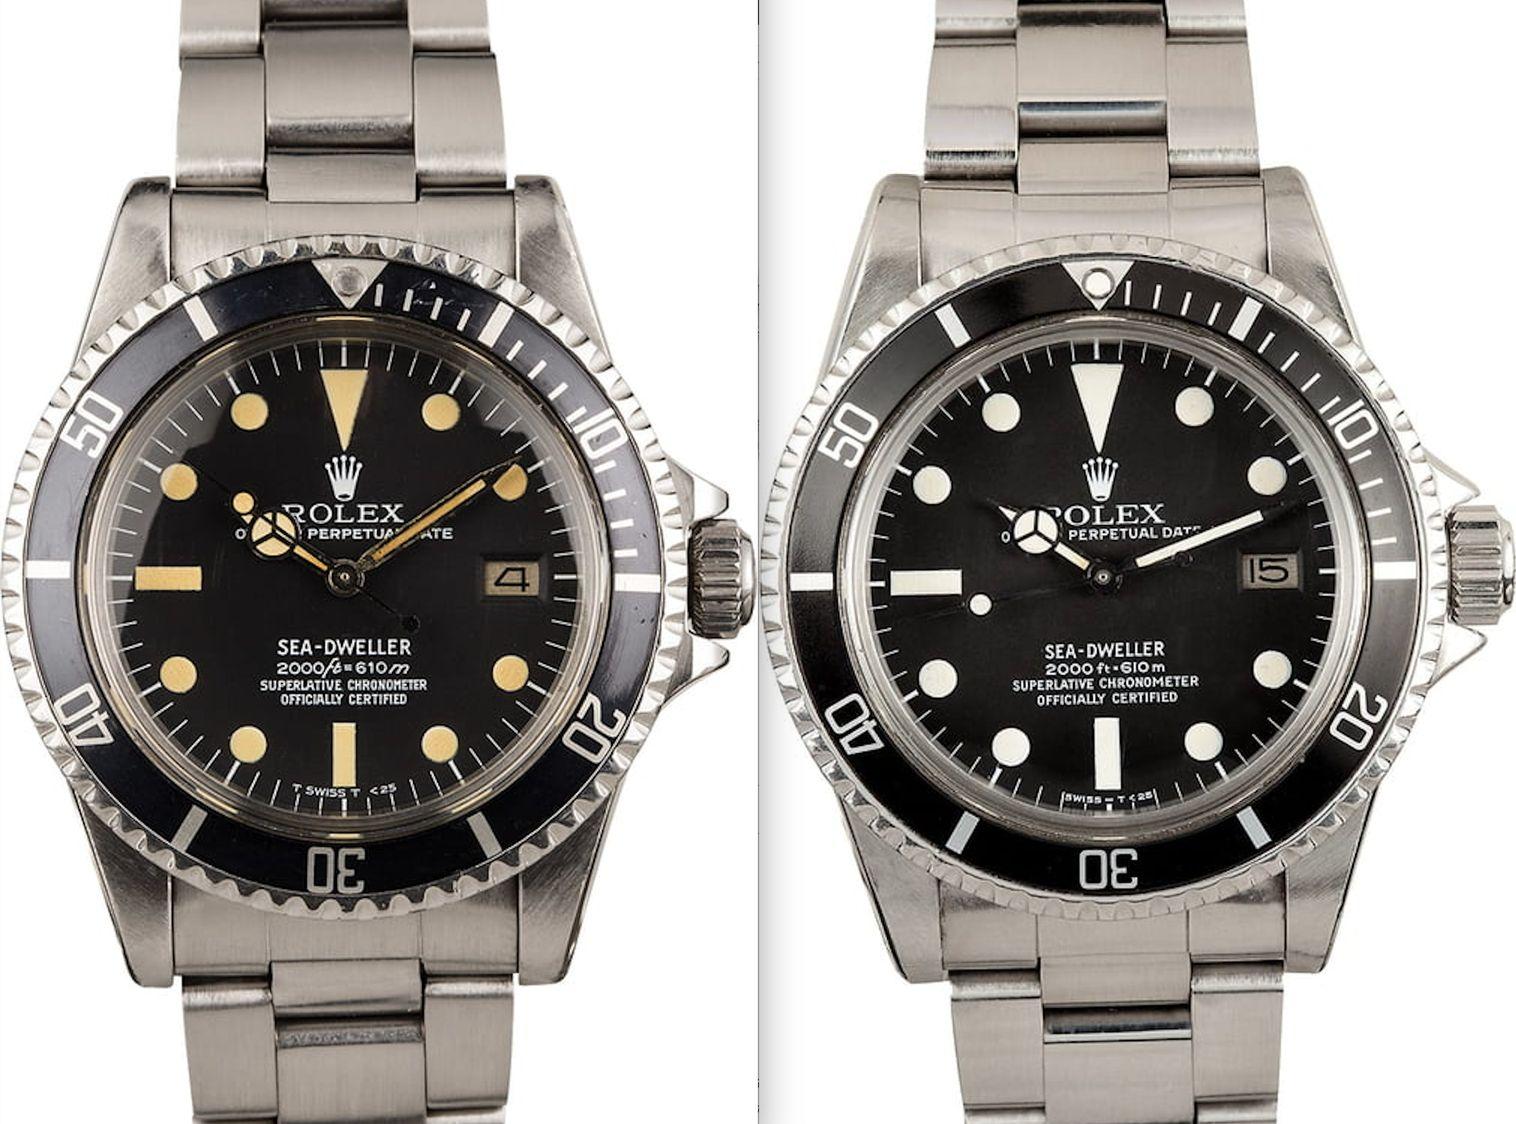 Rolex Sea-Dweller 1665 Tritium vs Rail Dial